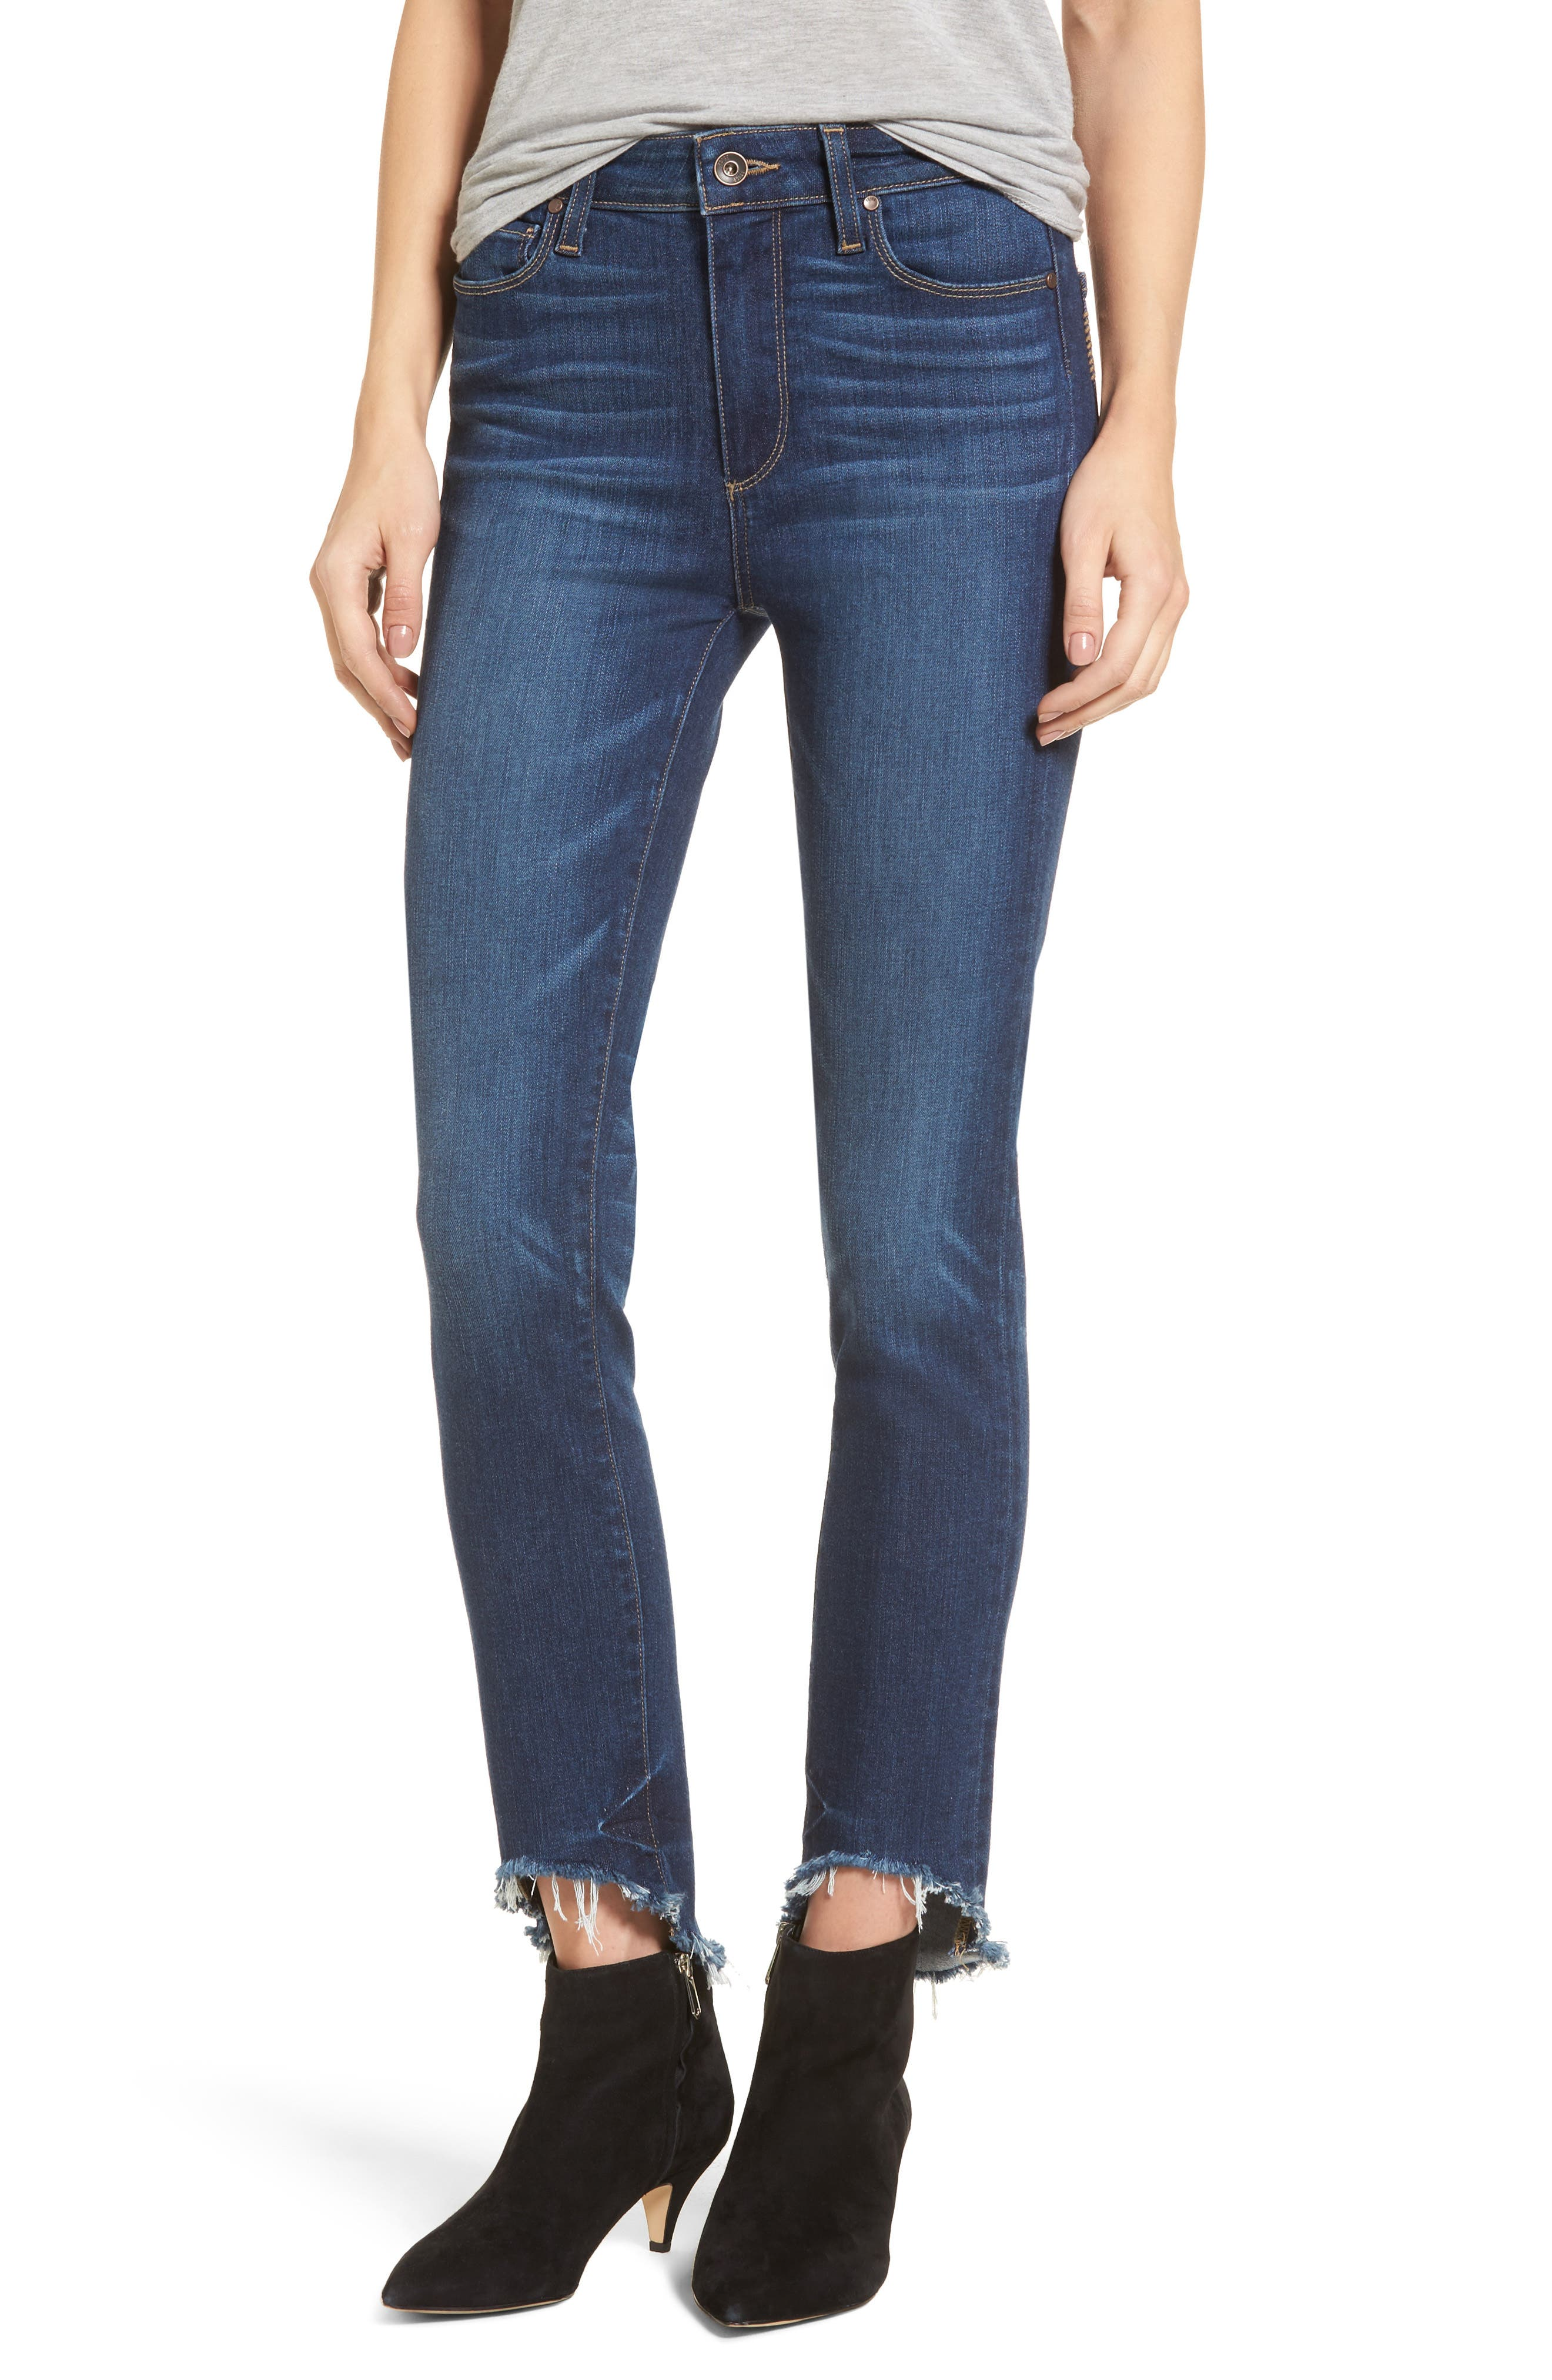 Transcend Vintage - Hoxton High Waist Ankle Skinny Jeans,                             Main thumbnail 1, color,